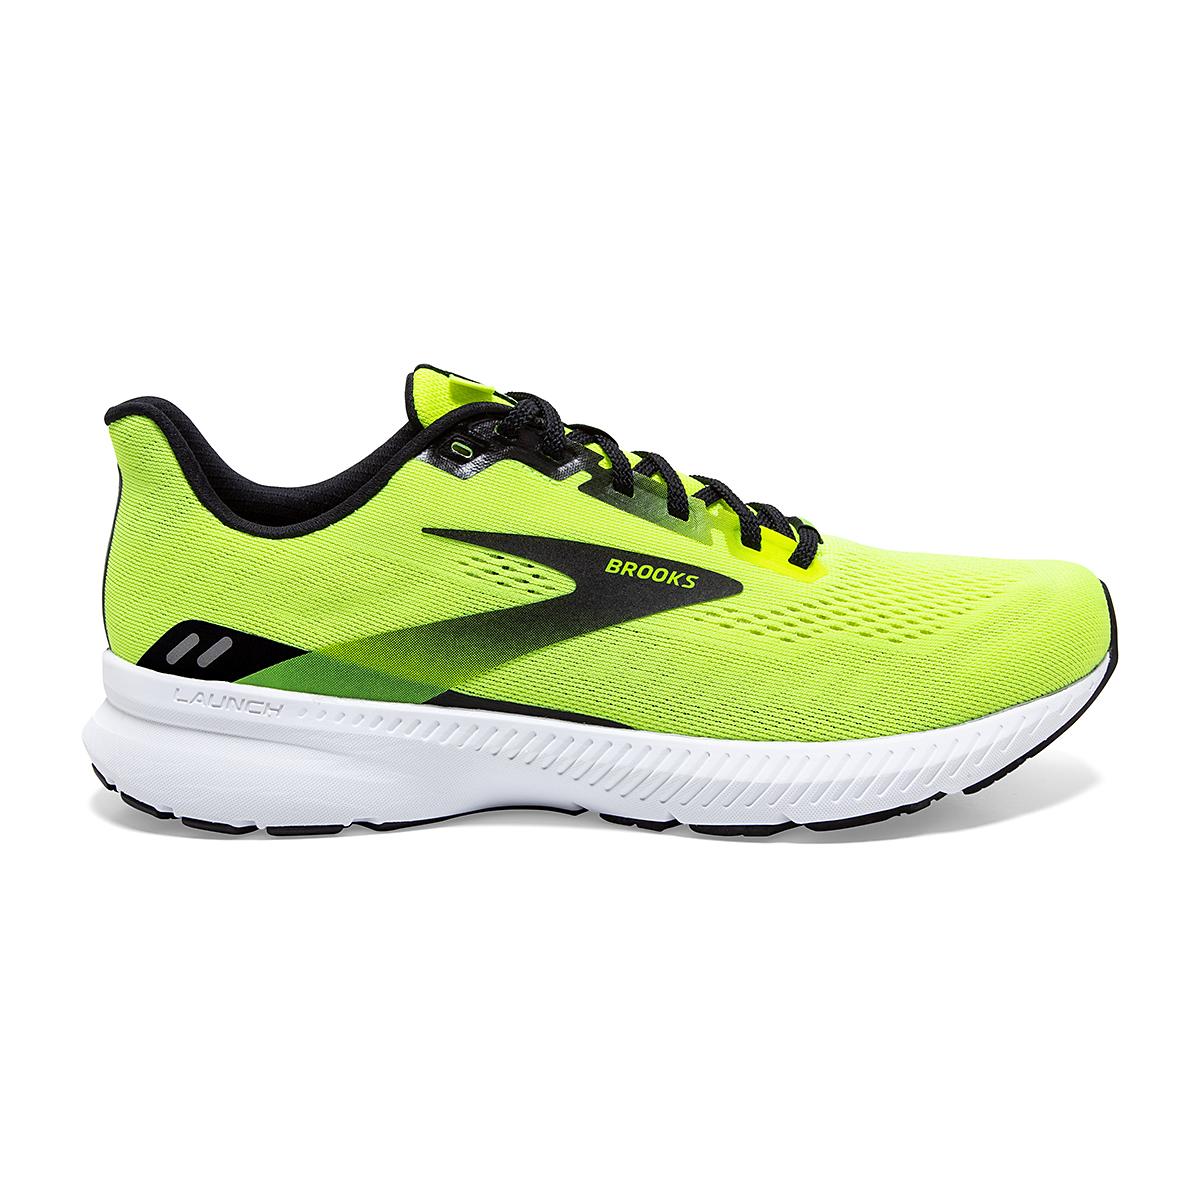 Men's Brooks Launch 8 Running Shoe - Color: Nightlife/Black/White - Size: 7 - Width: Regular, Nightlife/Black/White, large, image 1